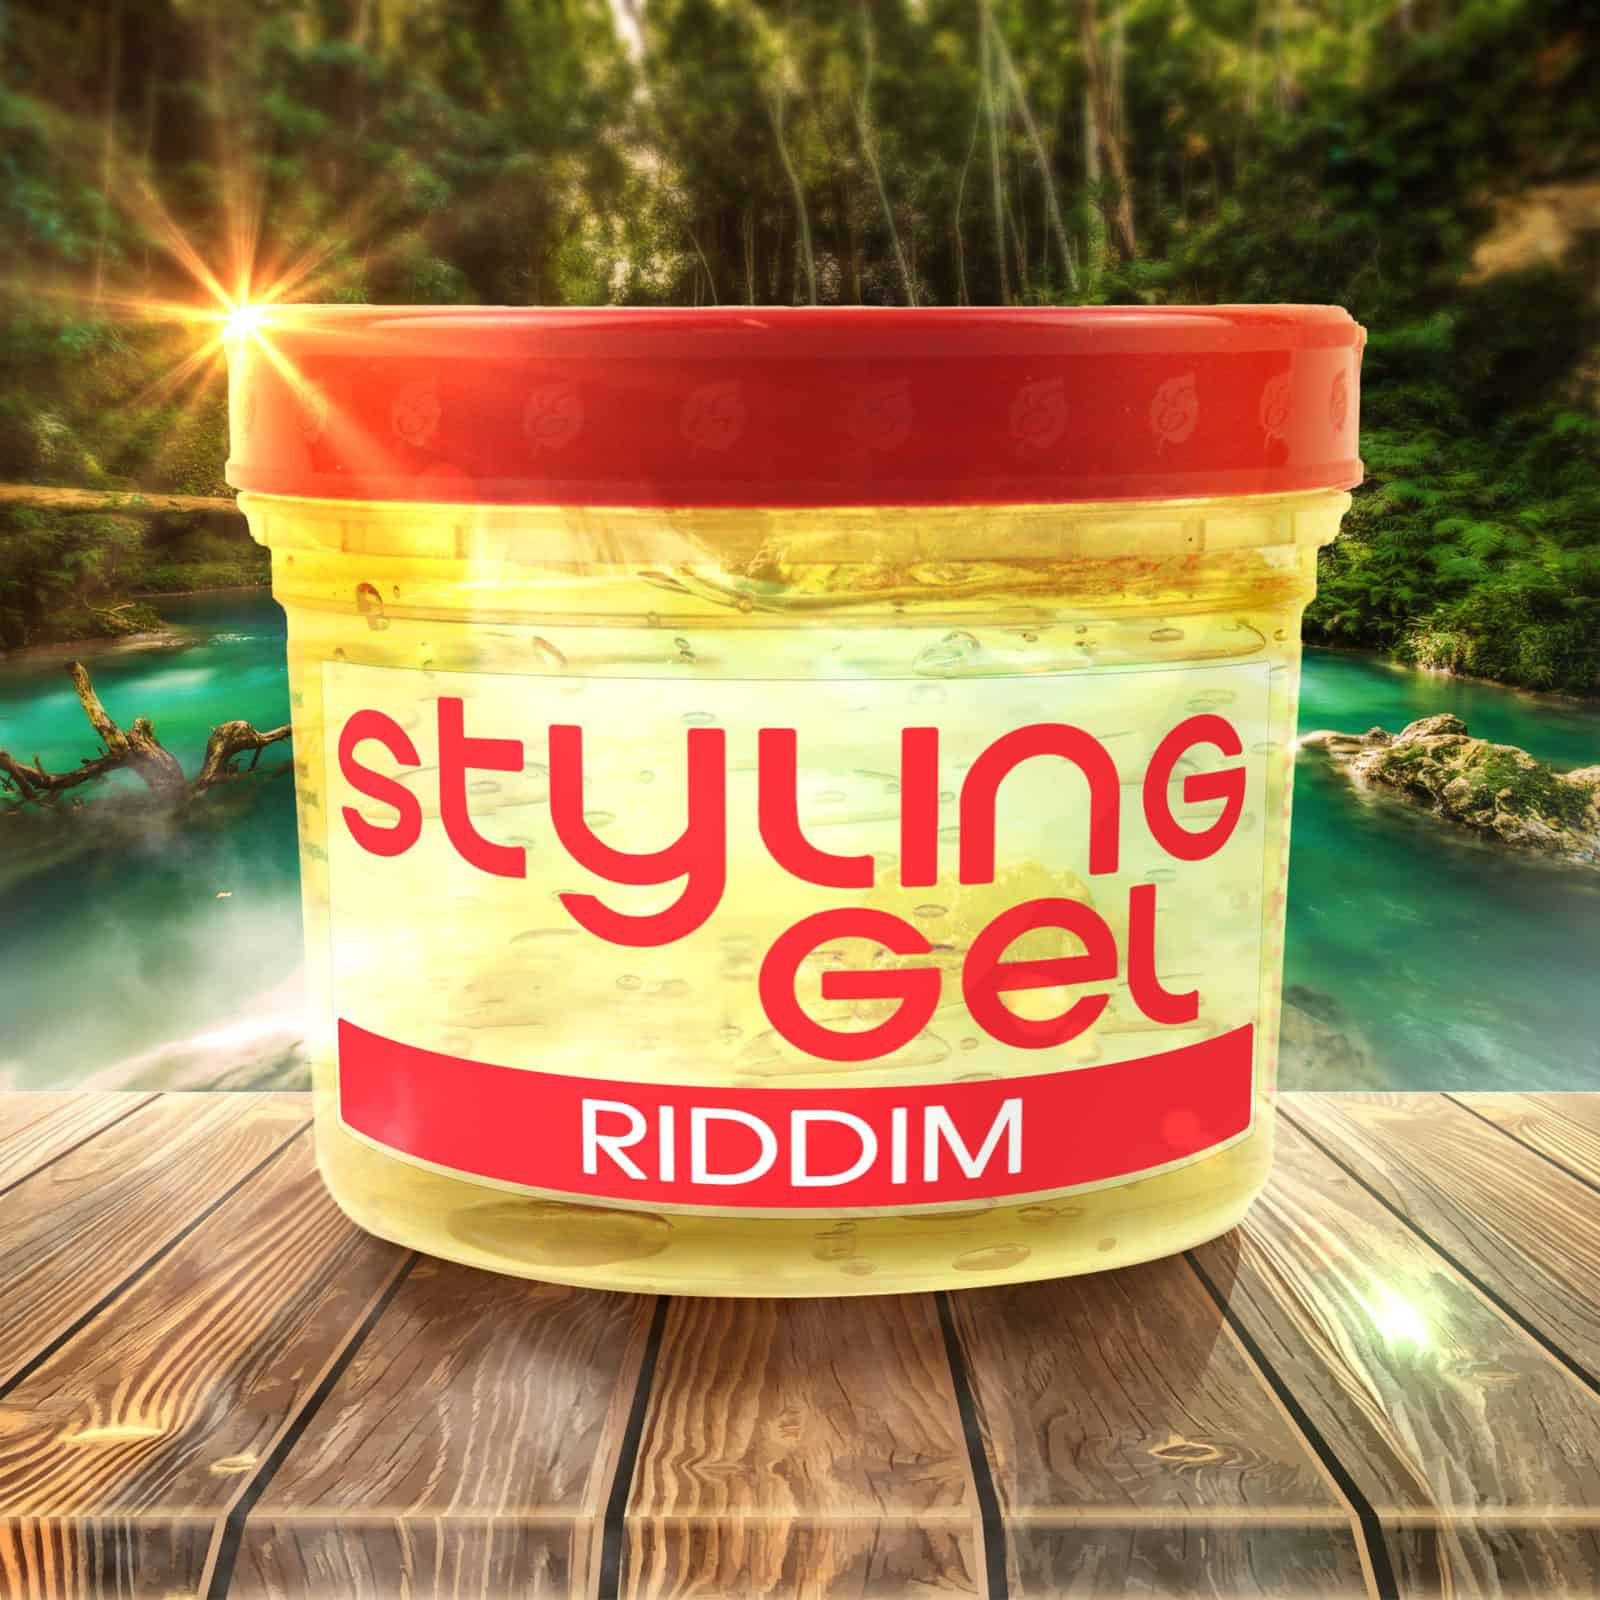 Styling Gel Riddim - Supa Hype Music / RamJam Production